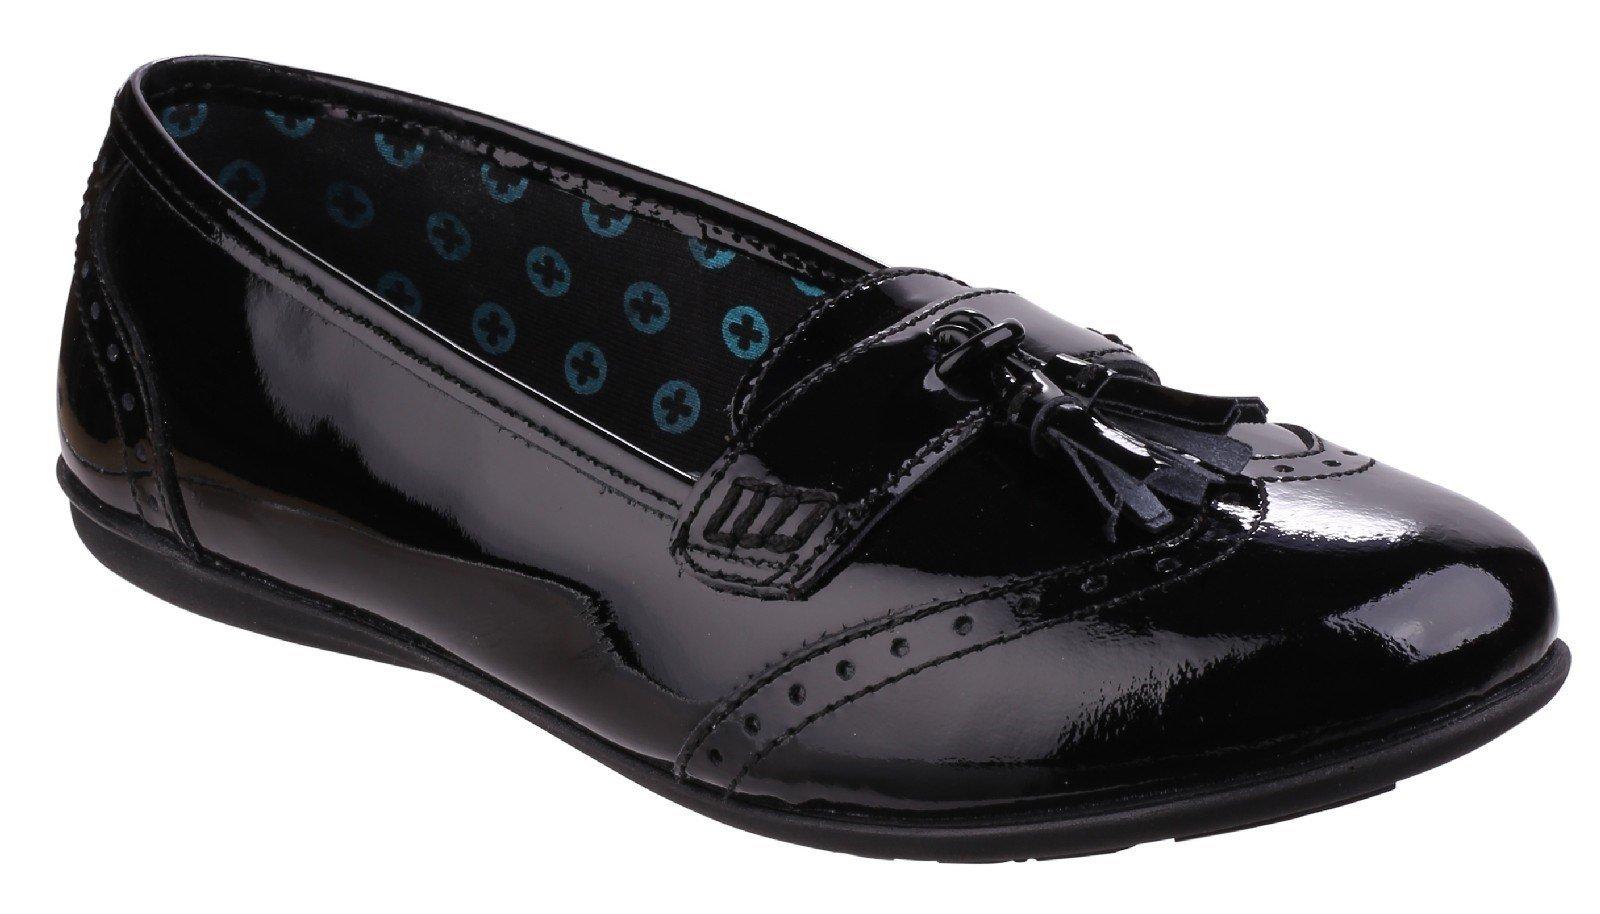 Hush Puppies Women's Esme School Shoe Black 25334 - Black 13.5 UK